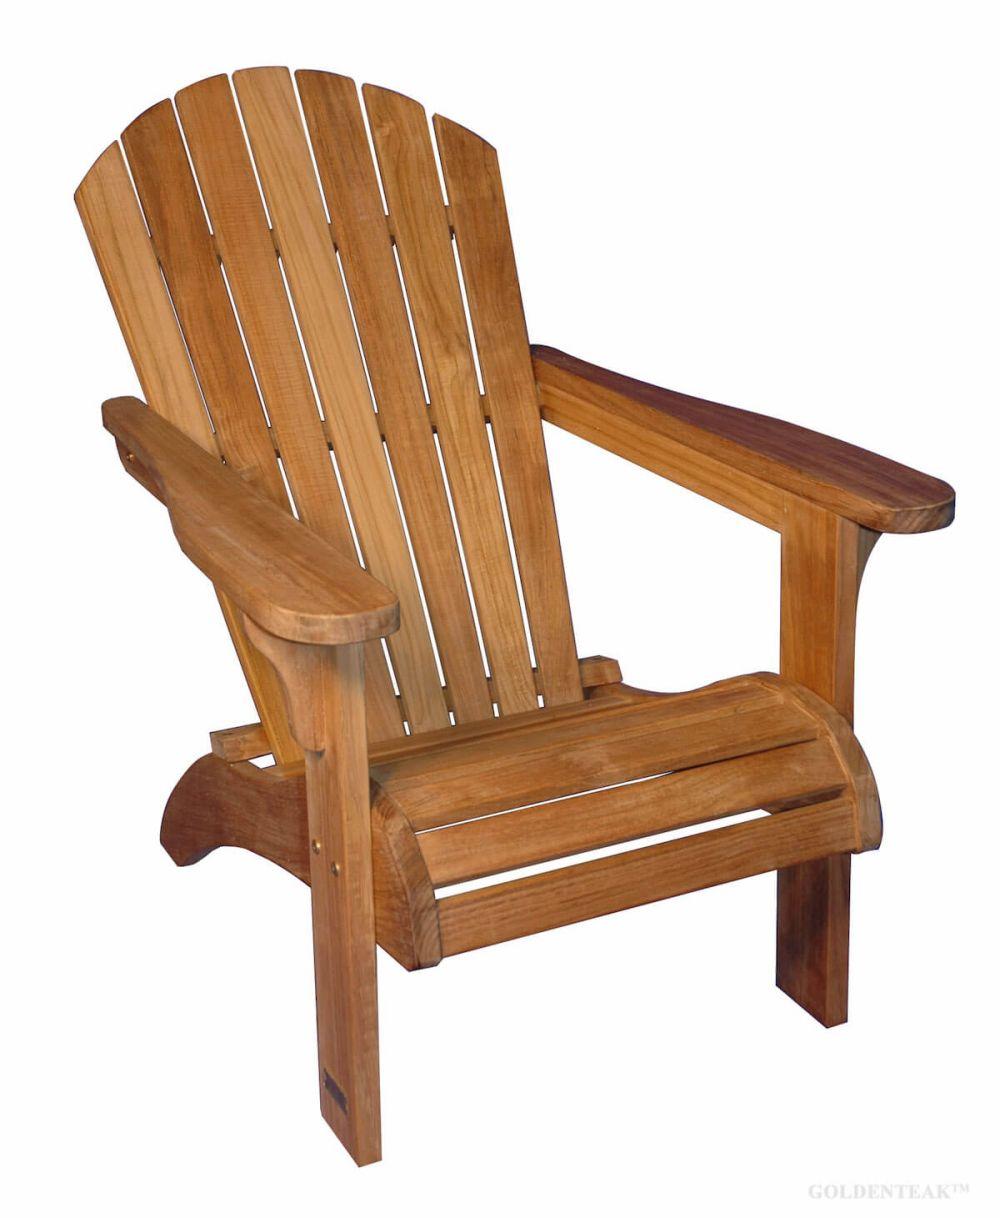 Teak Adirondack Chair Optional Footstool Goldenteak Patio Furniture